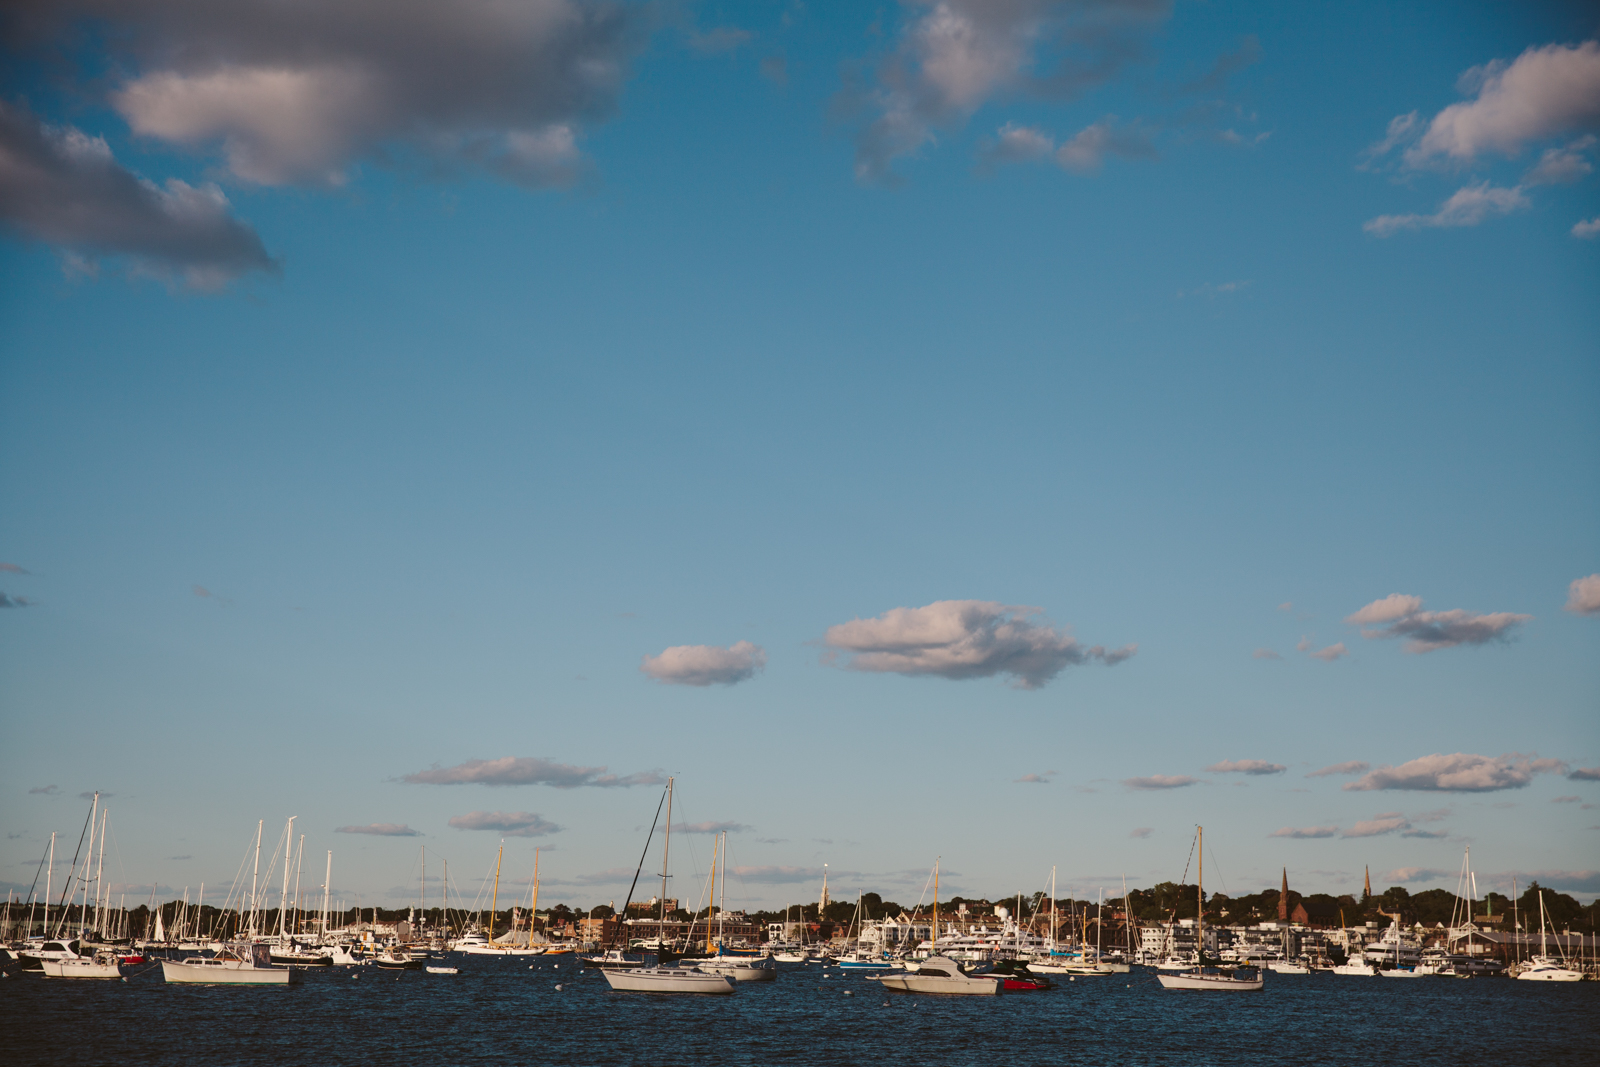 Eastons-Beach-Rotunda-Ballroom-Wedding-Newport-Rhode-Island-PhotographybyAmandaMorgan-78.jpg